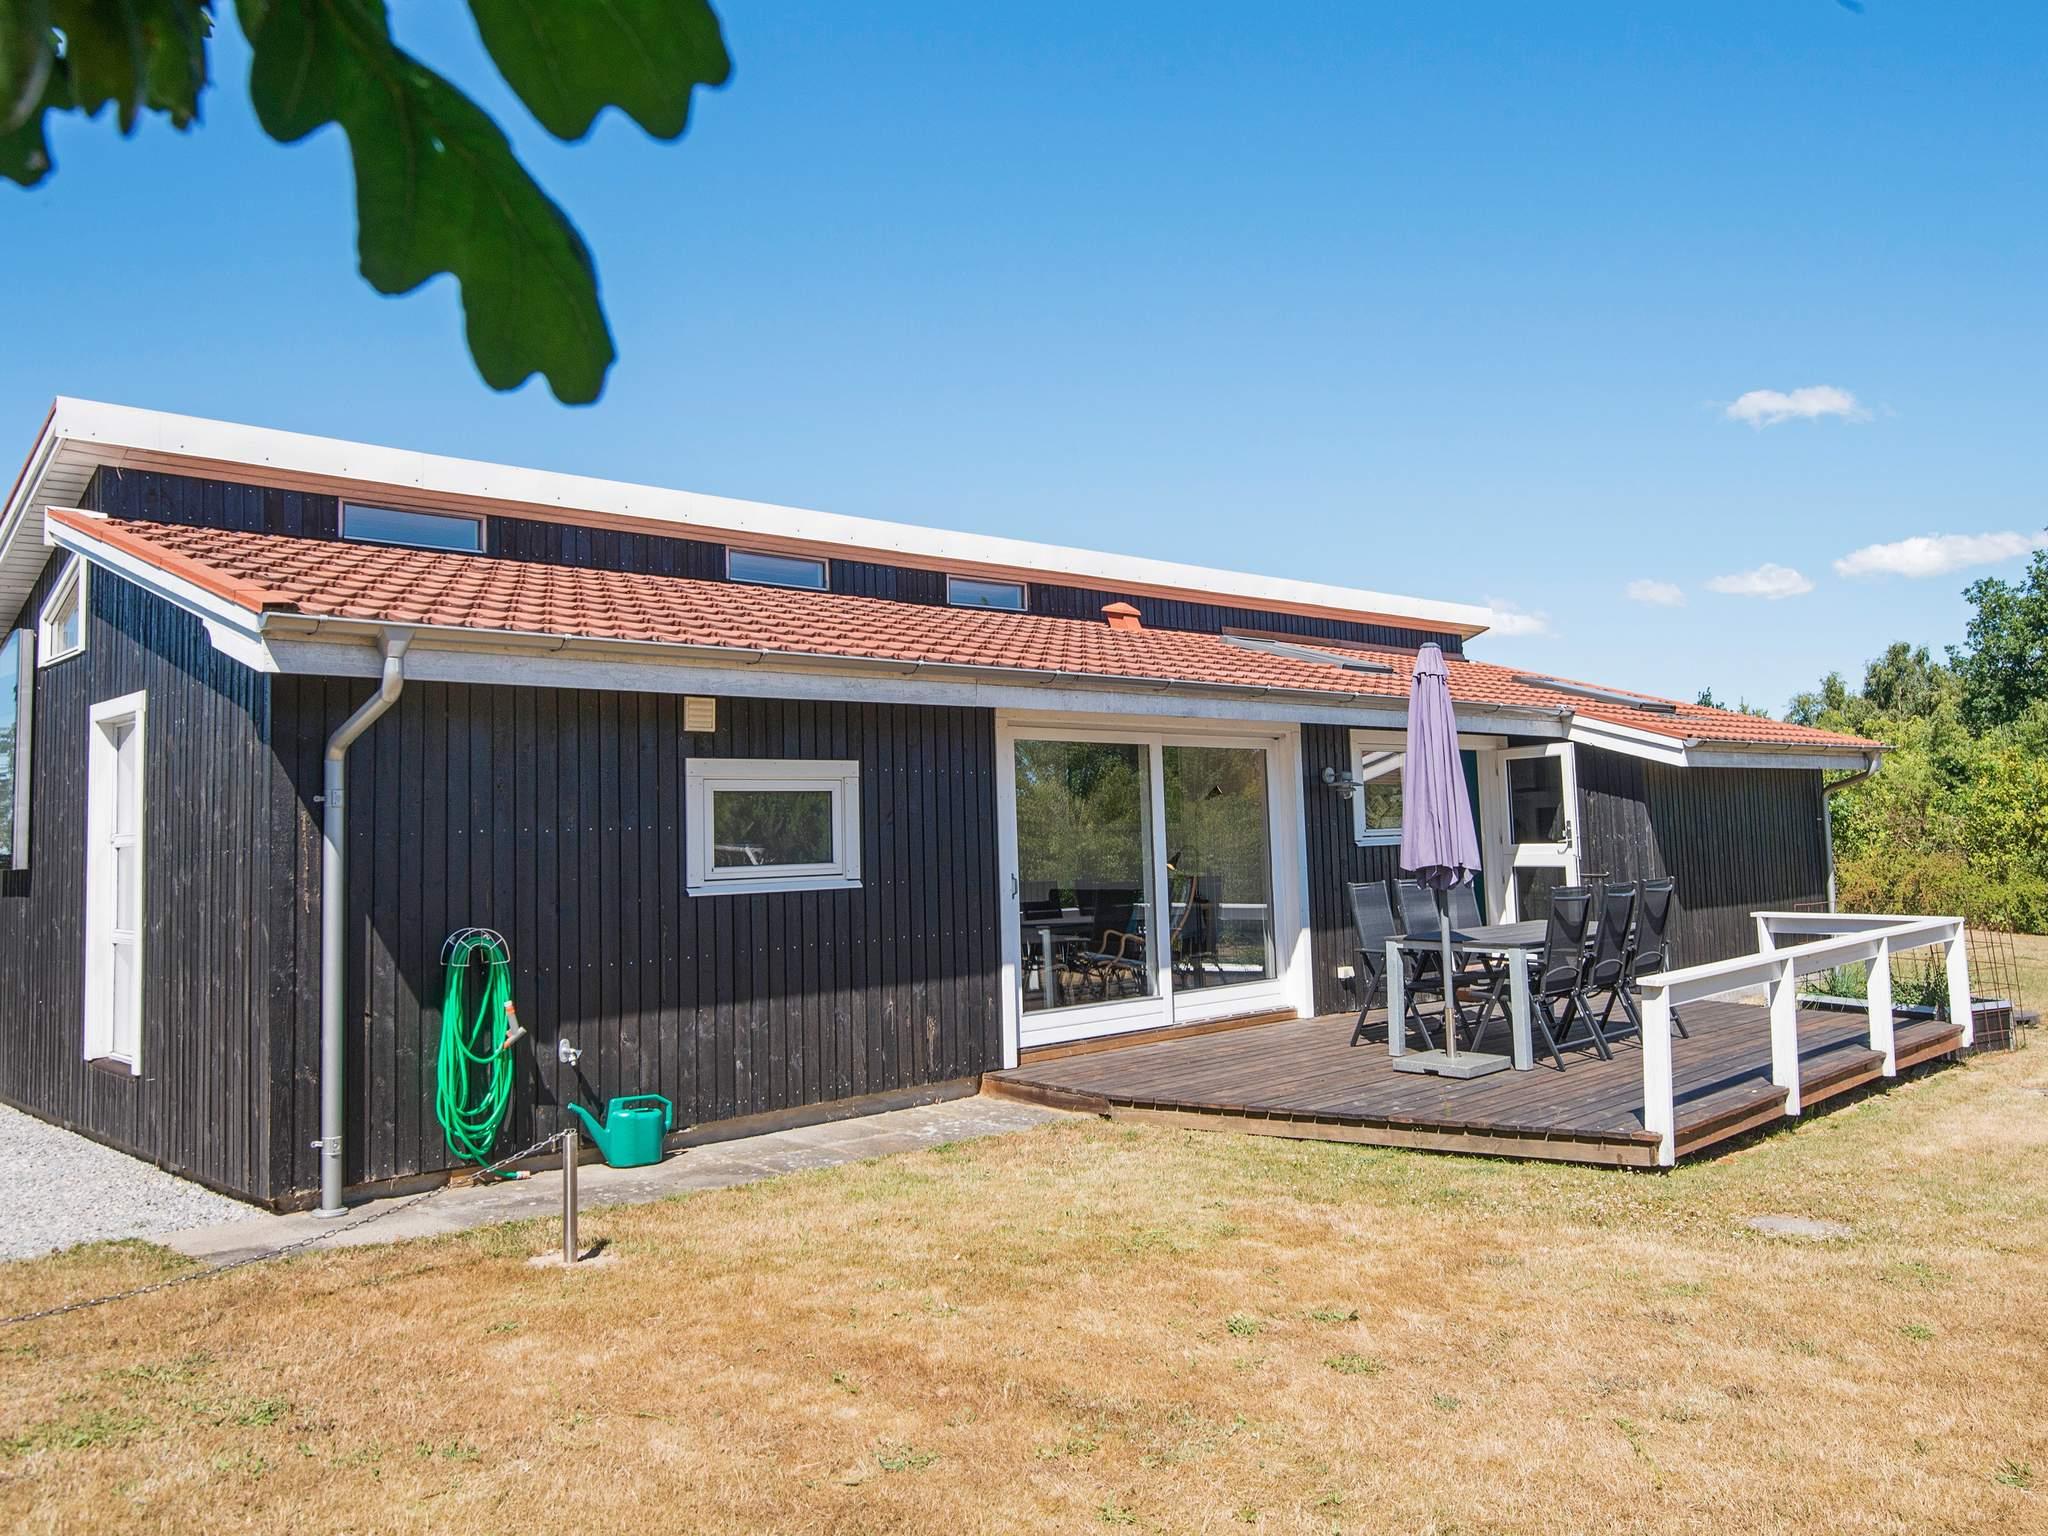 Maison de vacances Helgenæs (978615), Knebel, , Jutland Est, Danemark, image 1